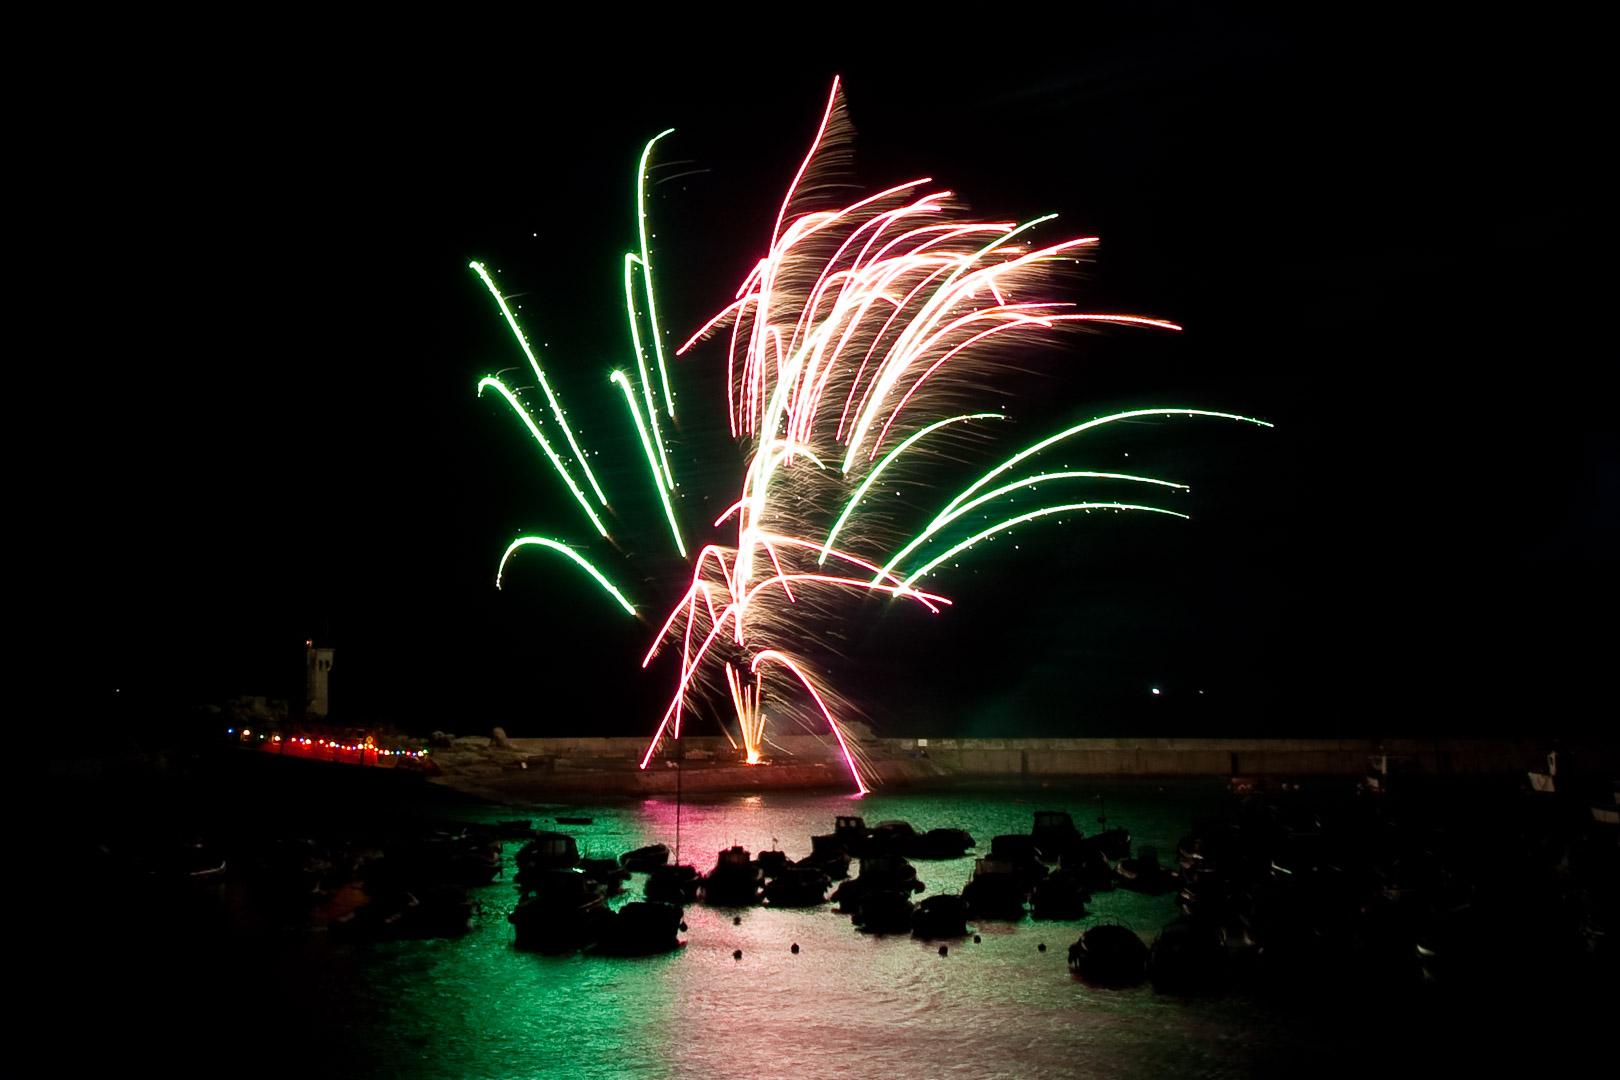 14. Juli 2009: Fest zum Nationalfeiertag in Trevignon